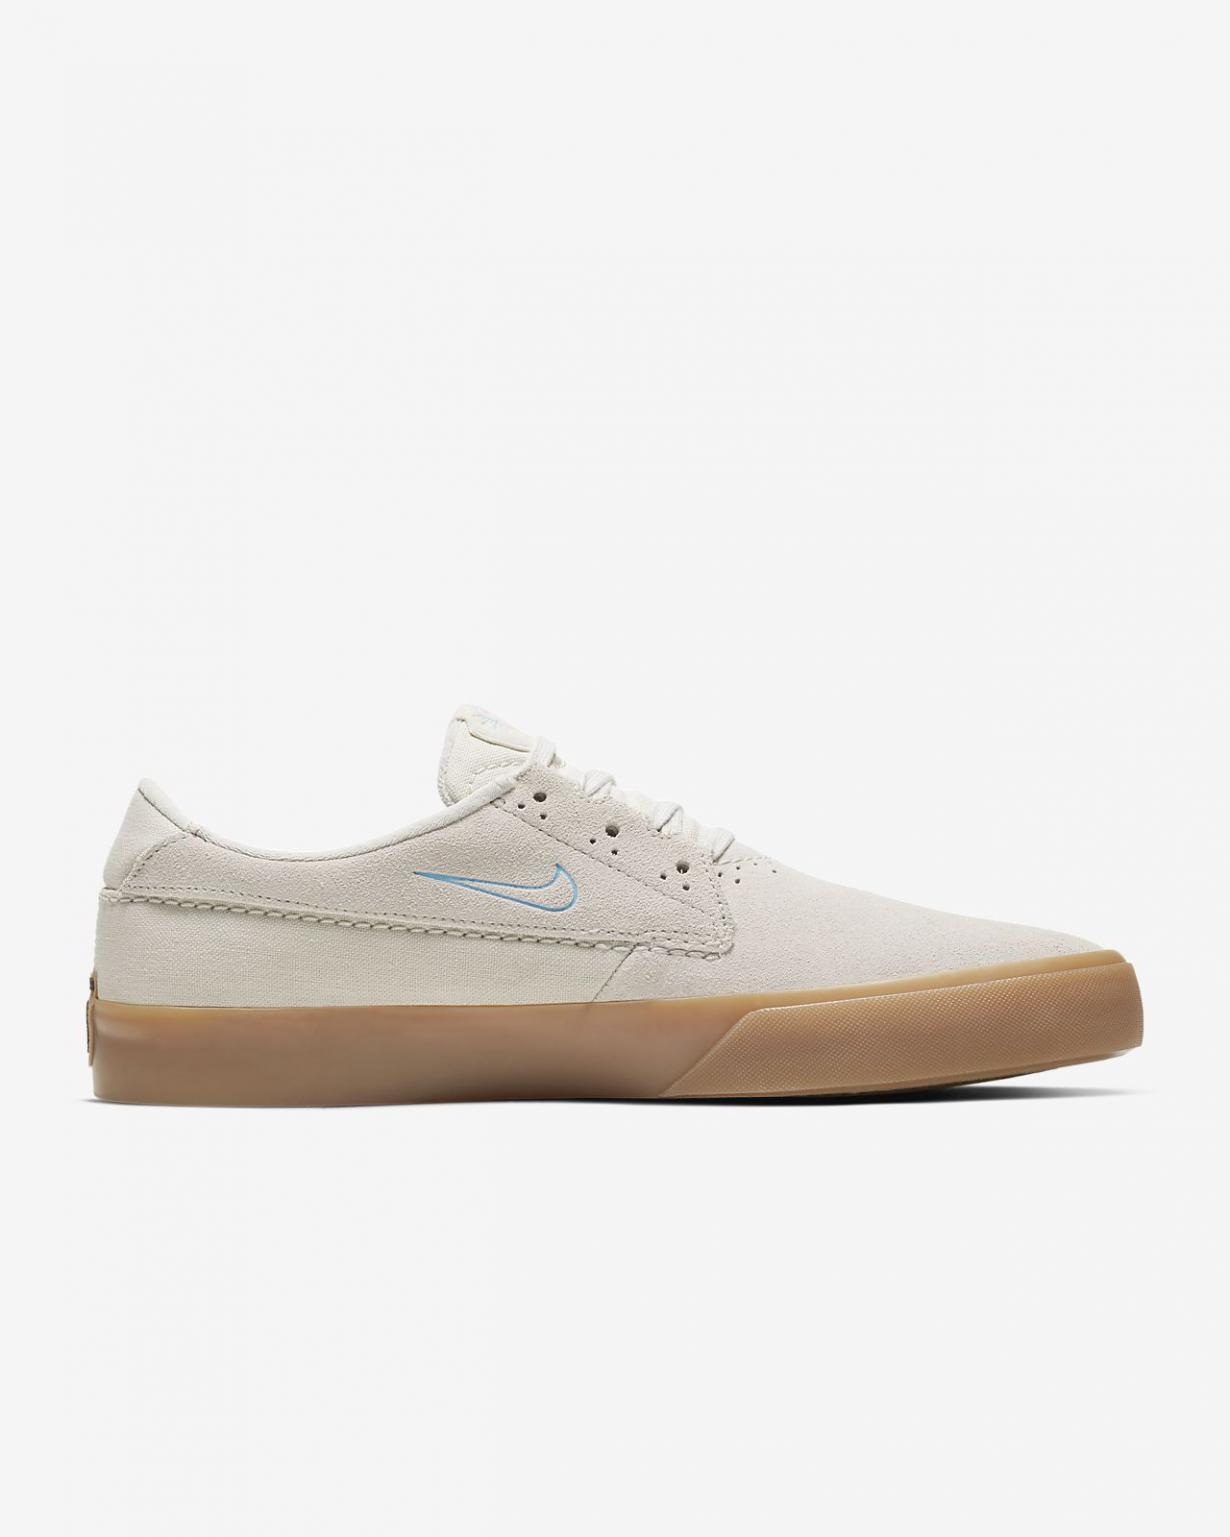 Skateboard Homme   SB Shane Blanc/Blanc/Gomme marron clair/Bleu laser   Nike < Gooddaytricities